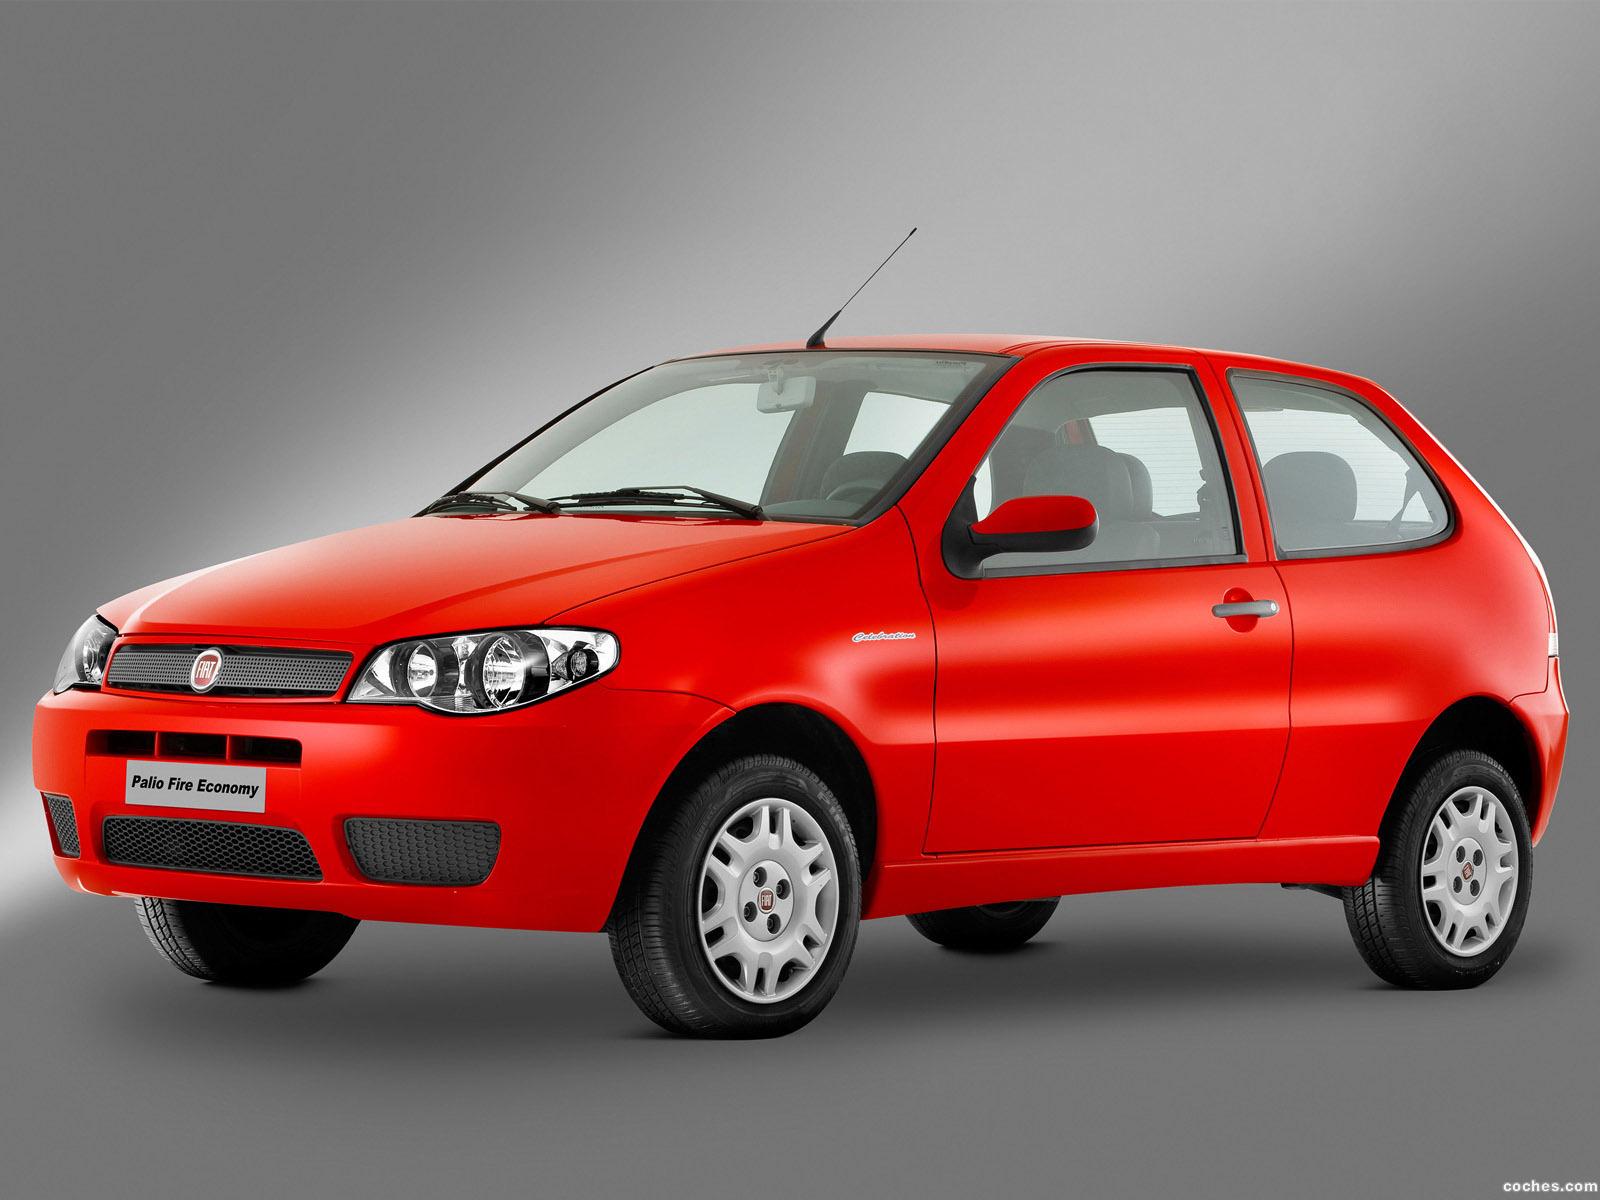 Foto 0 de Fiat Palio Fire Economy 3 puertas 2009